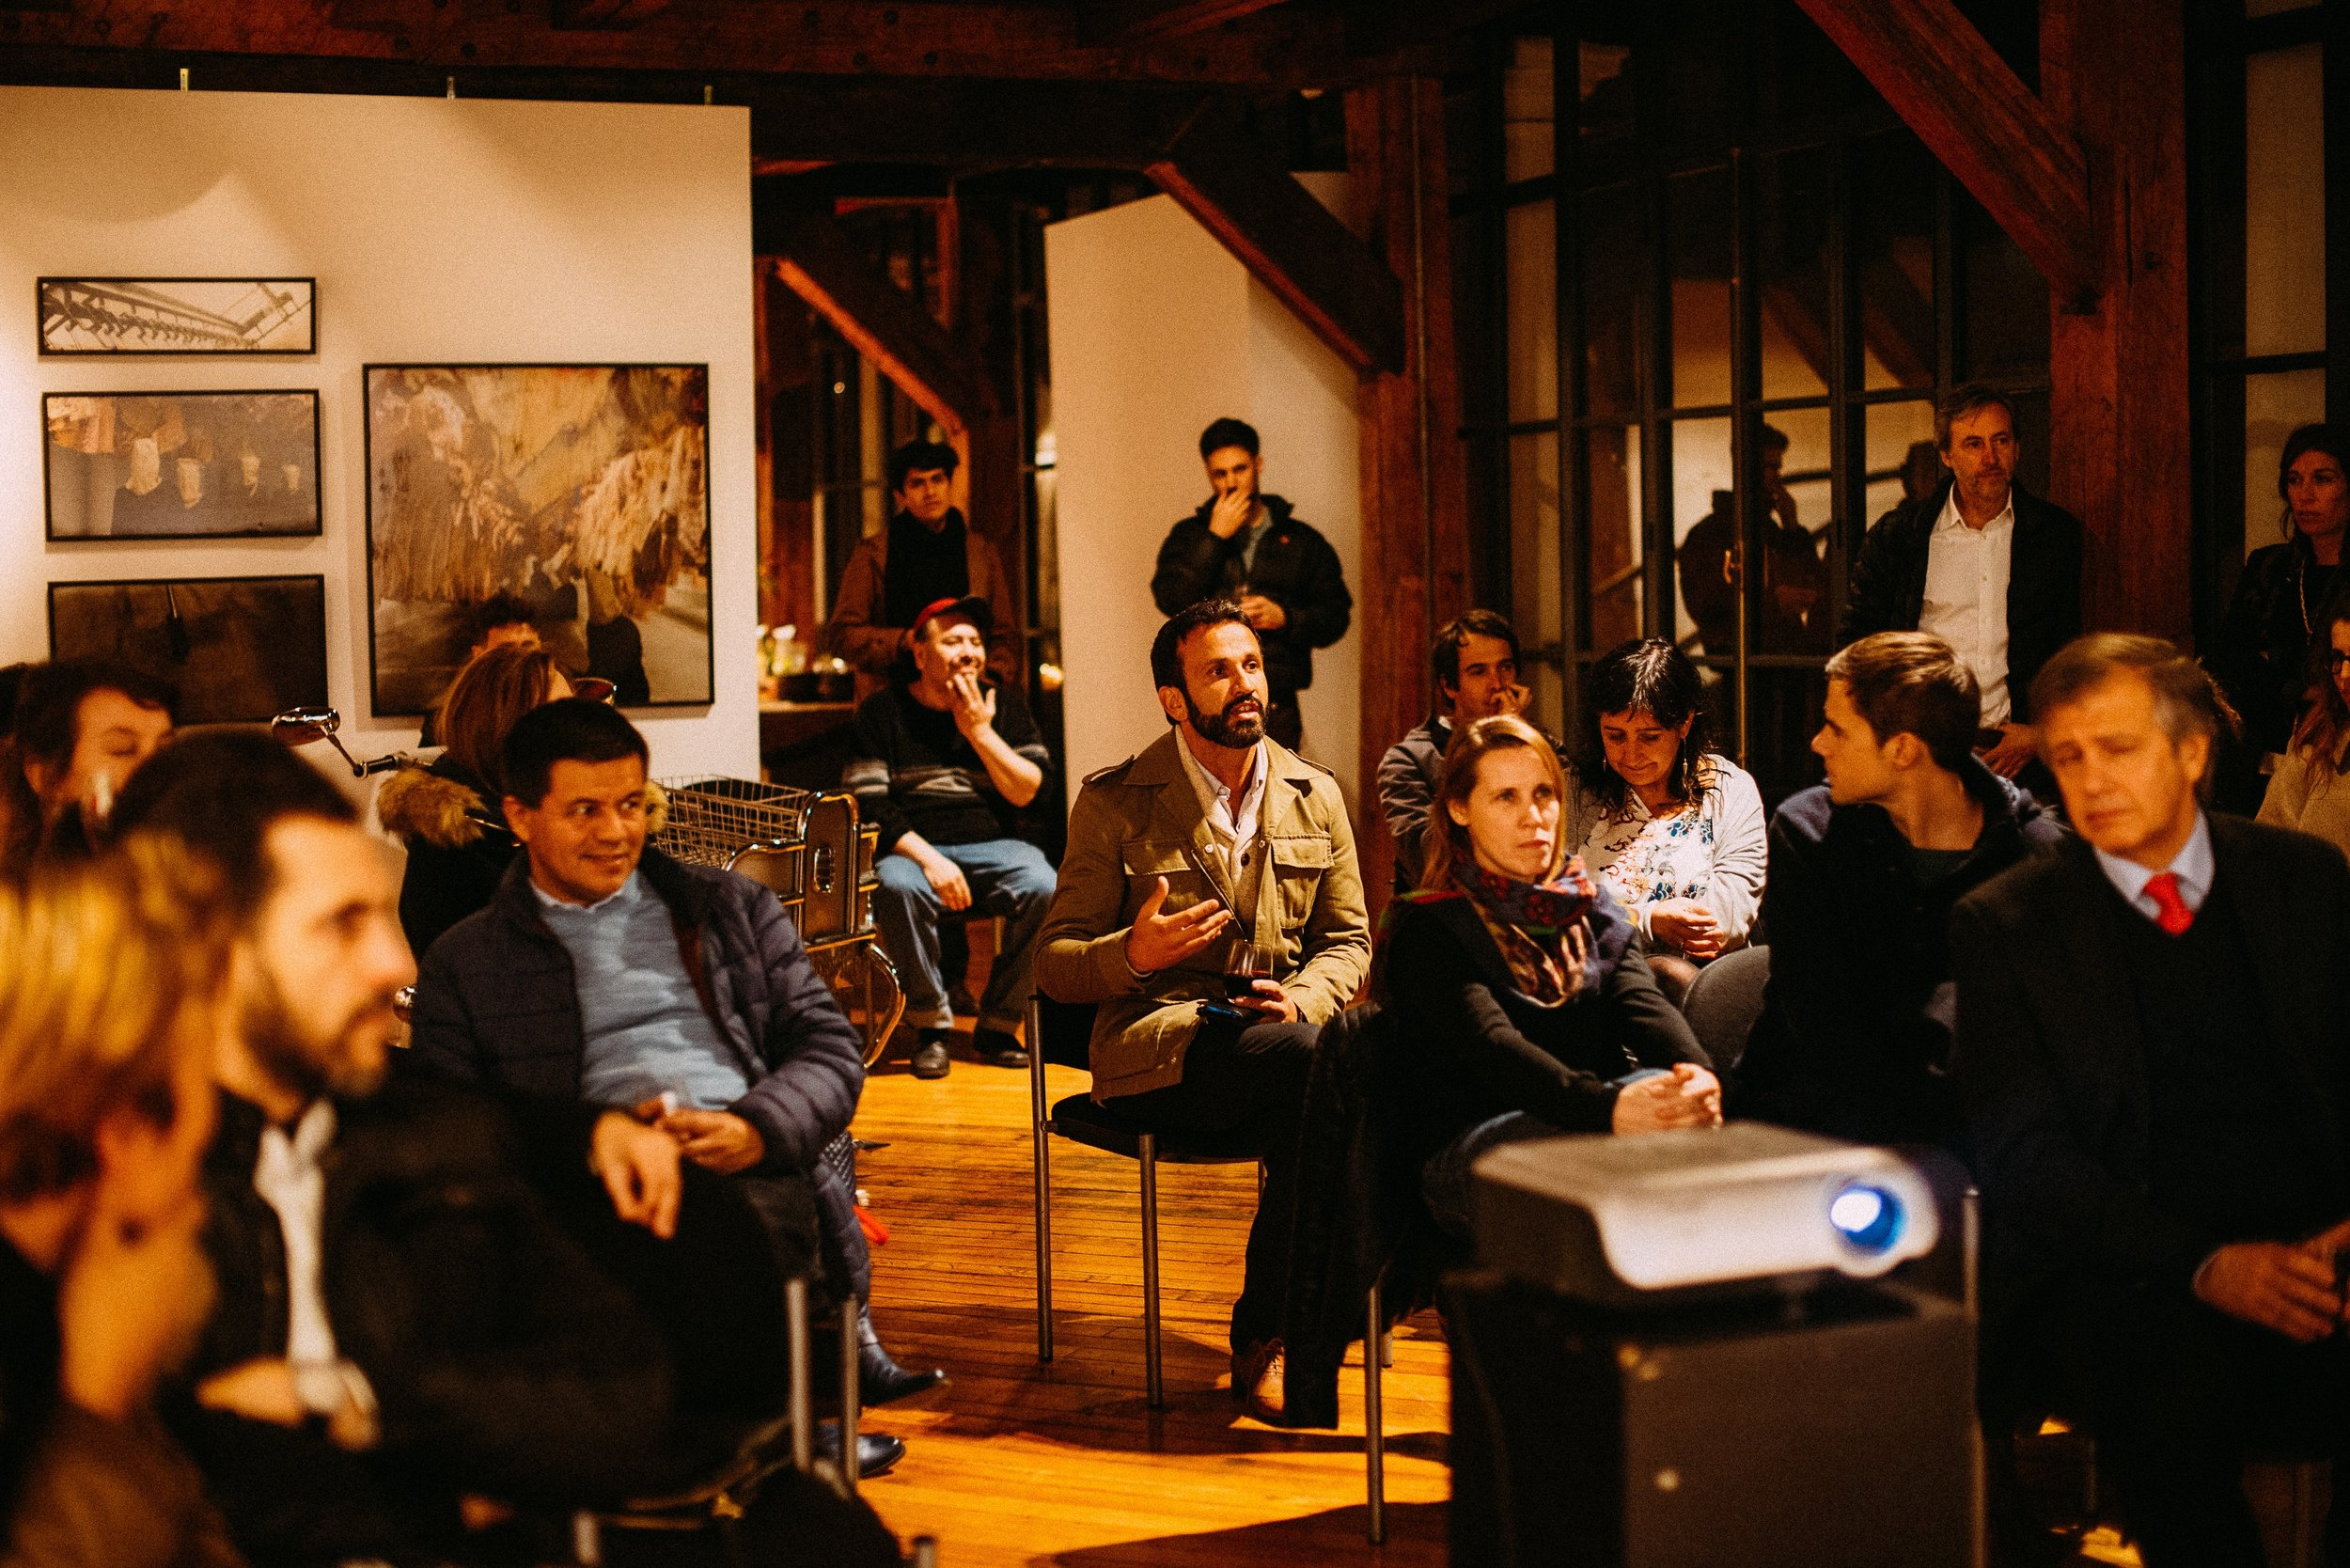 Presentations & Interviews - ariety of topics.